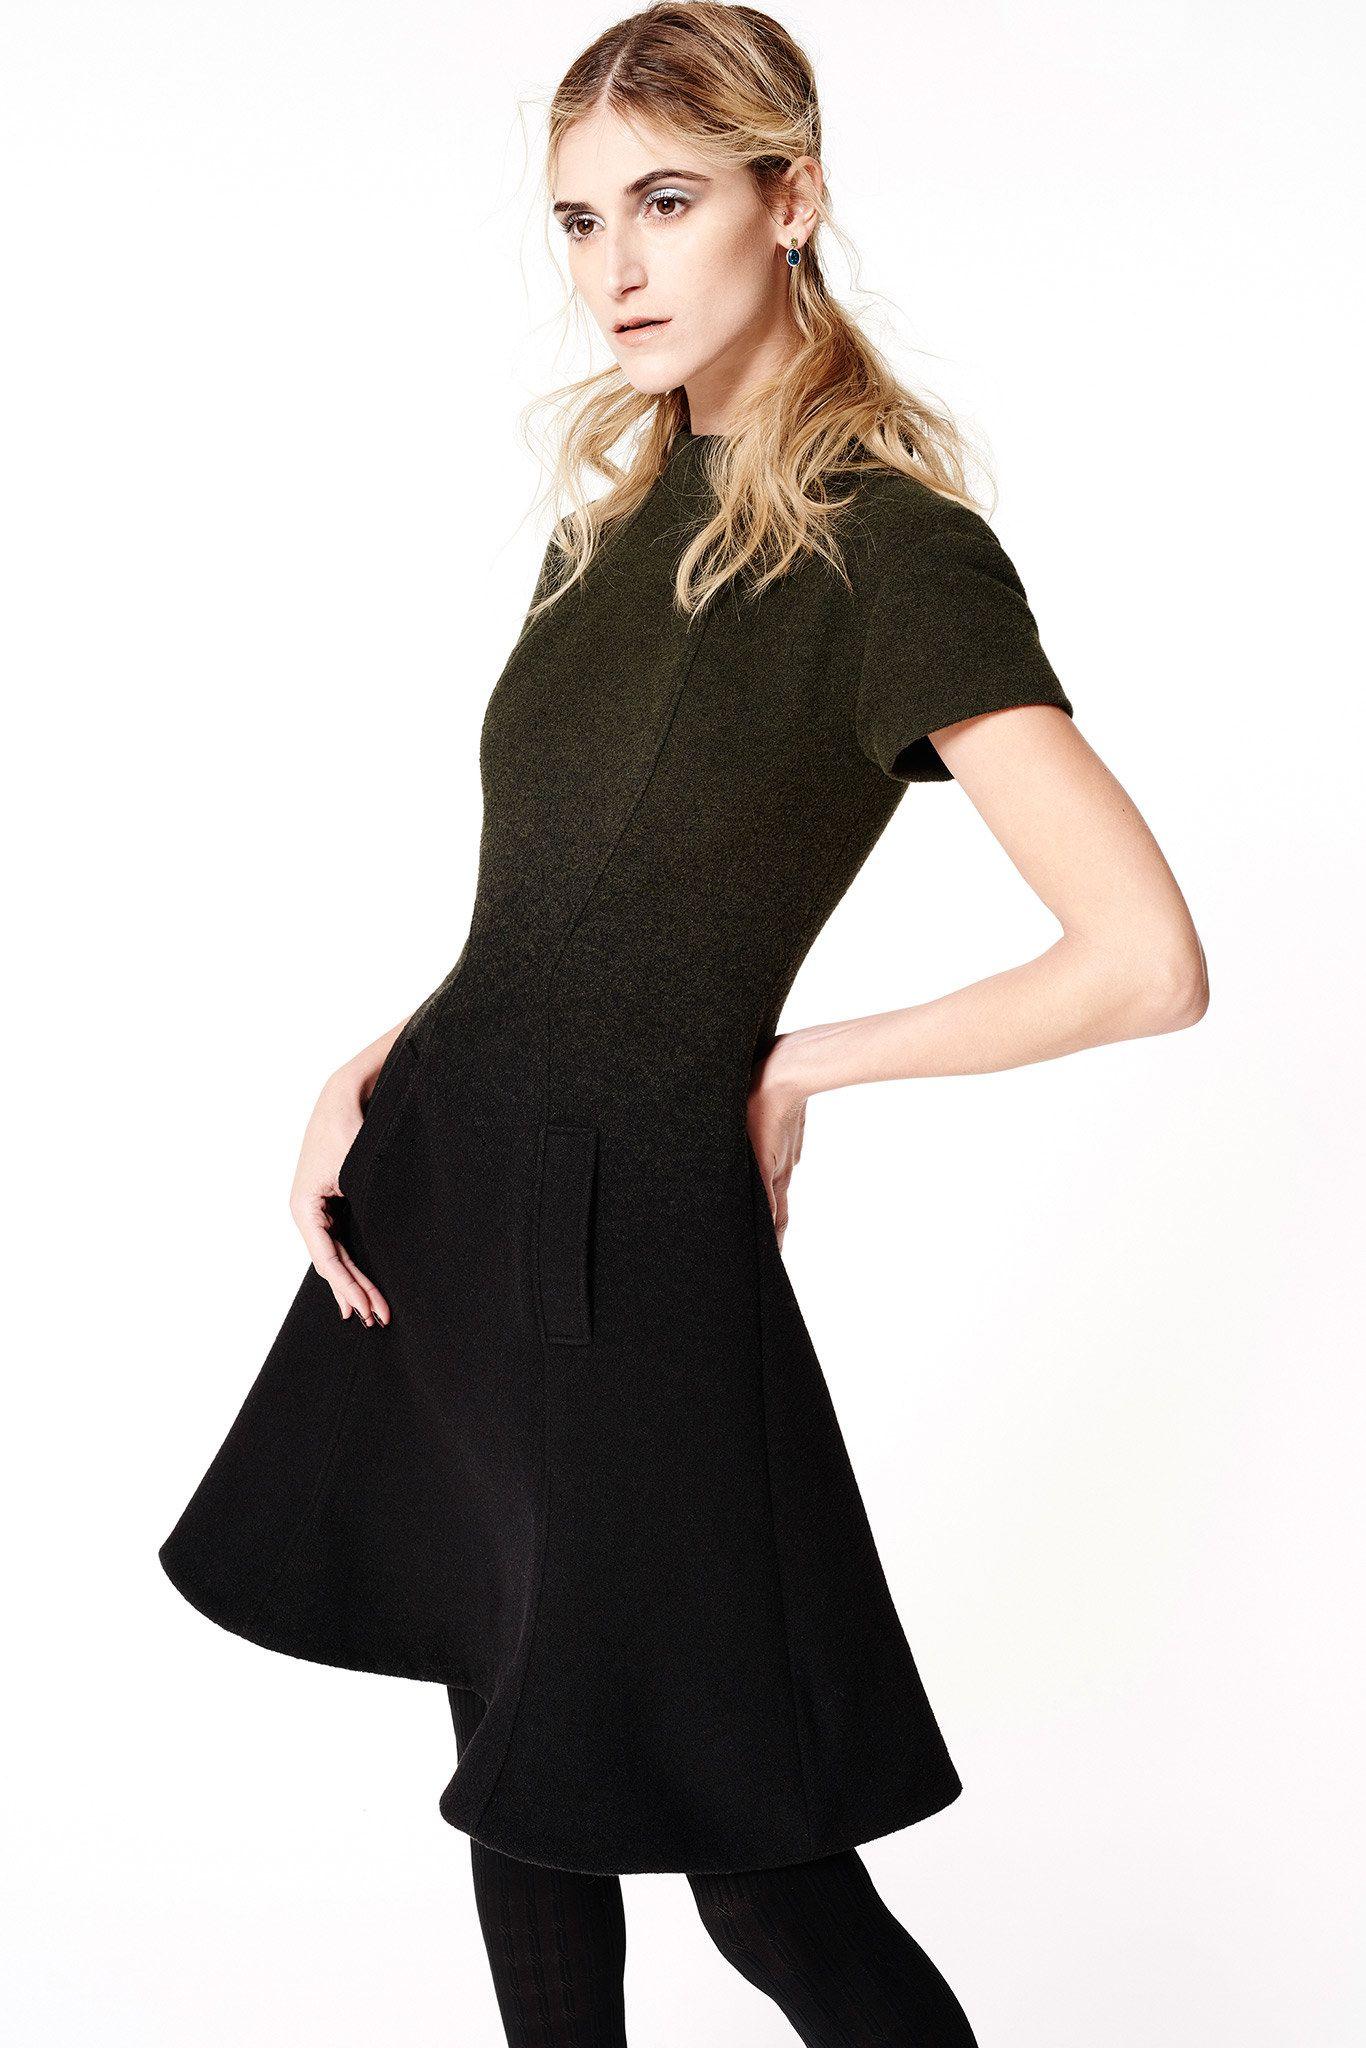 ZAC Zac Posen | Fall 2015 Ready-to-Wear | 01 Green/black short sleeve mini dress